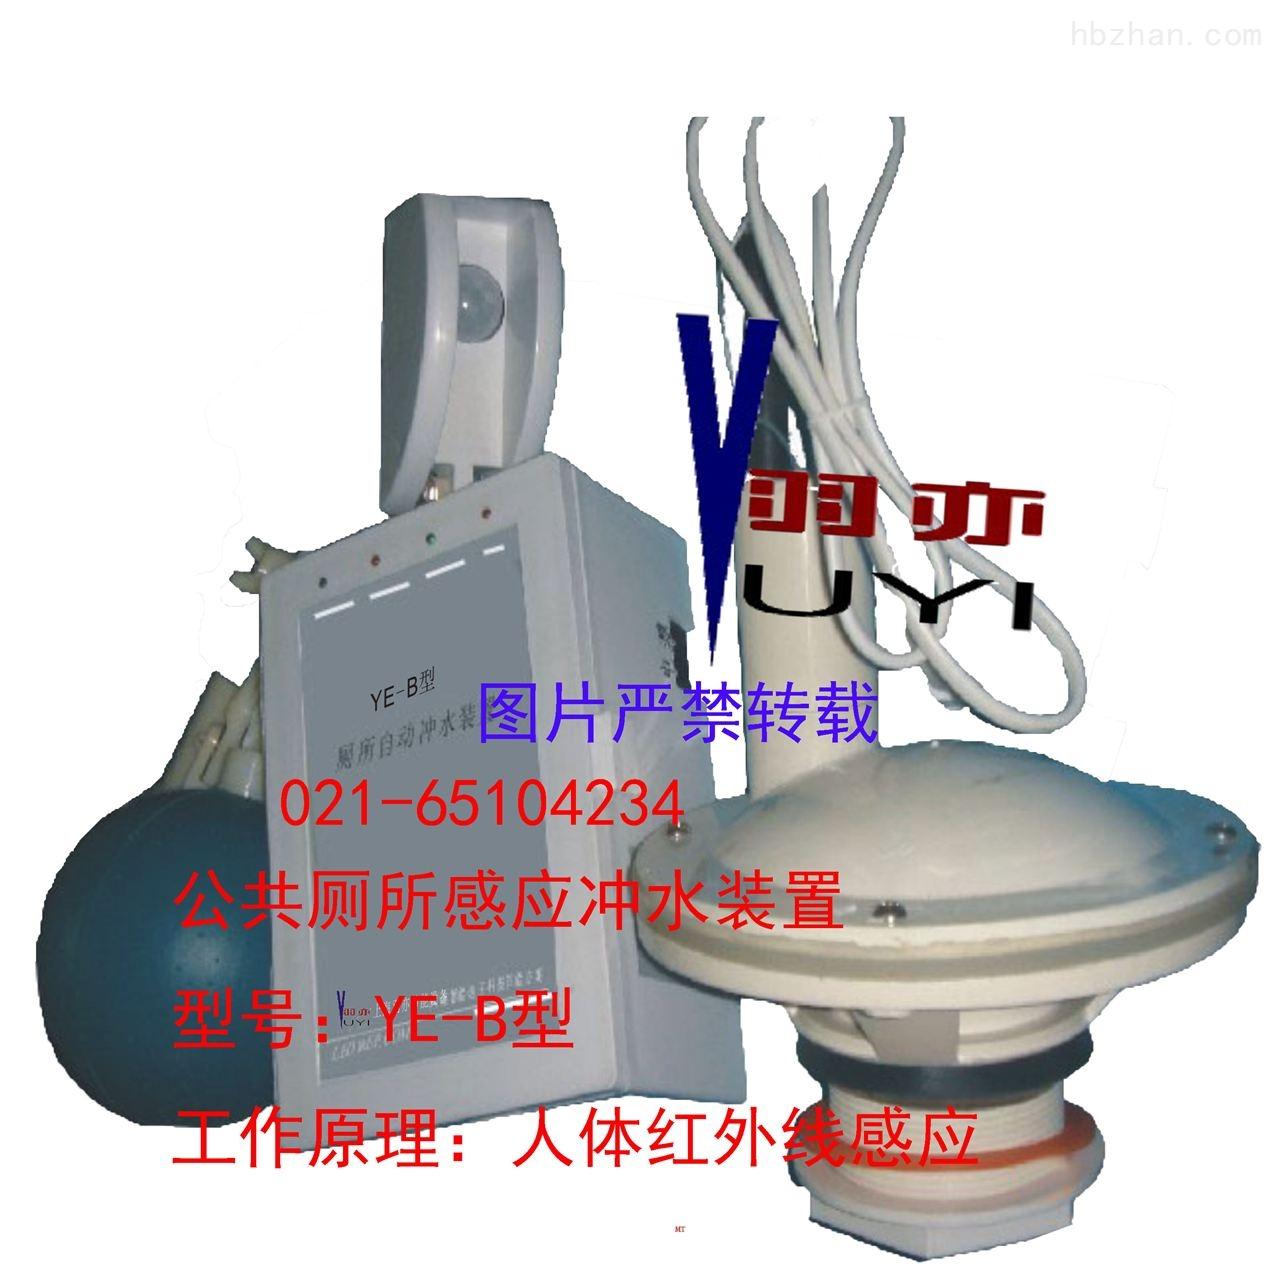 ye-b公共厕所感应冲水装置